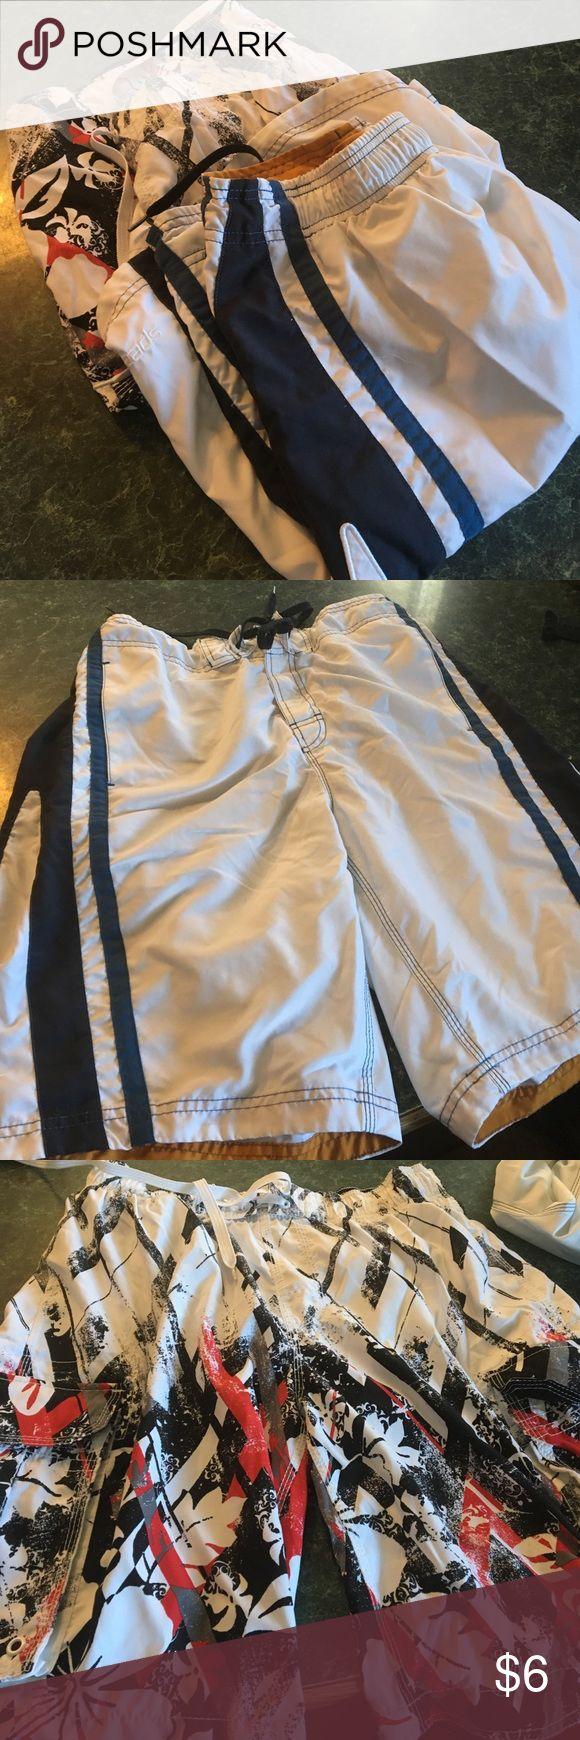 Men's swim shorts Bundle!!🐠🐟🐬 Men's Speedo swim shorts size 34 (white and blue) and Arizona swim shorts size 34 (red/black/white)🐟🐠 Speedo Swim Swim Trunks